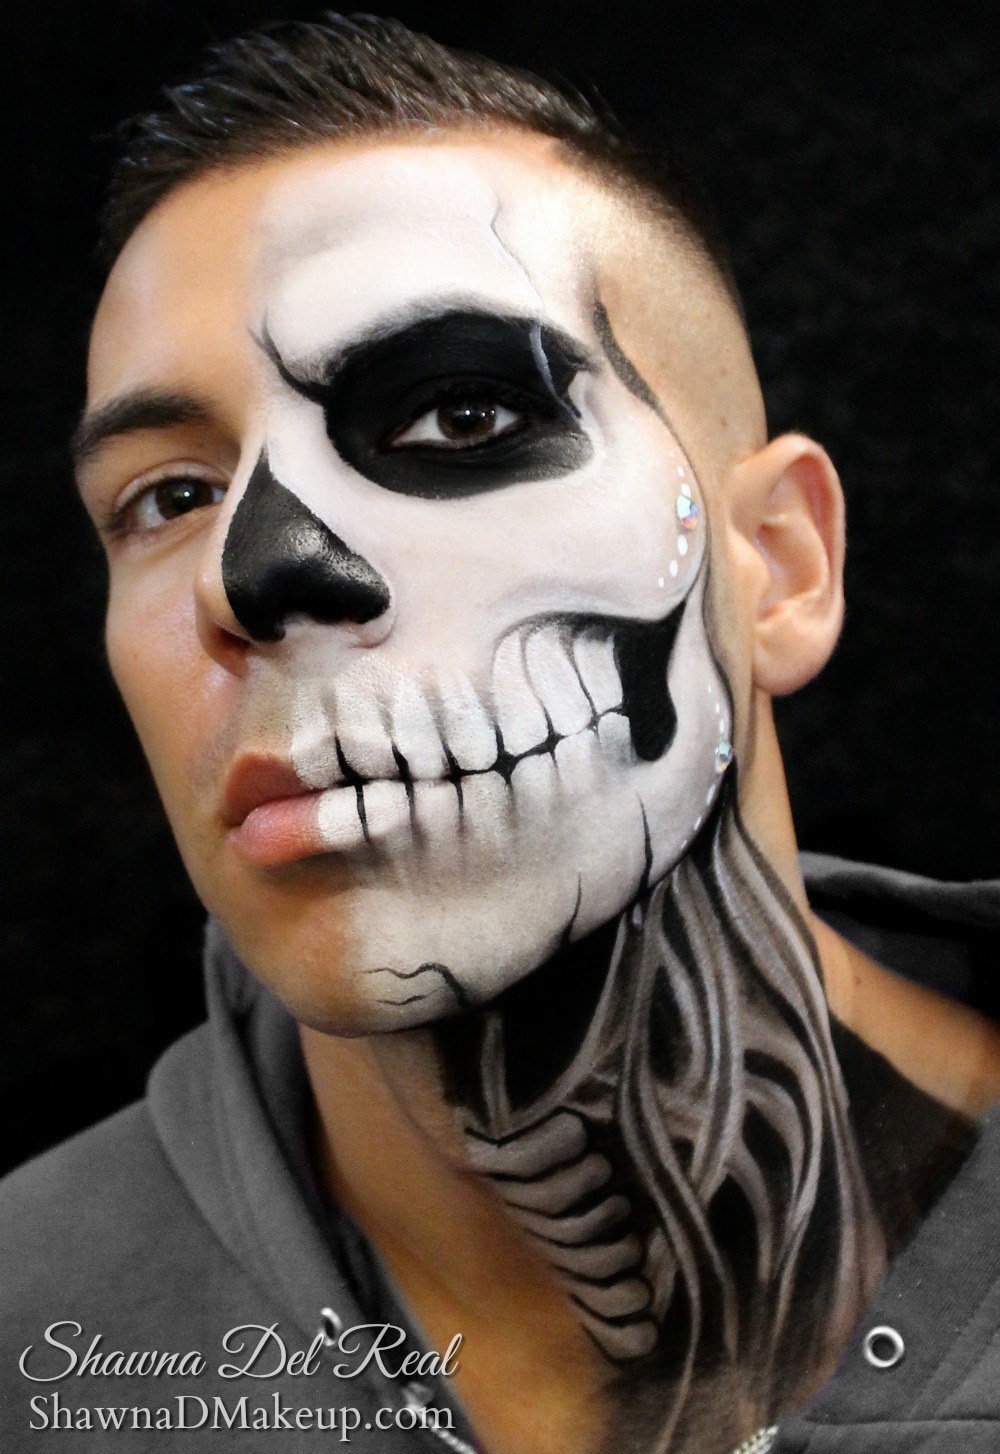 Shawna D. Make-up